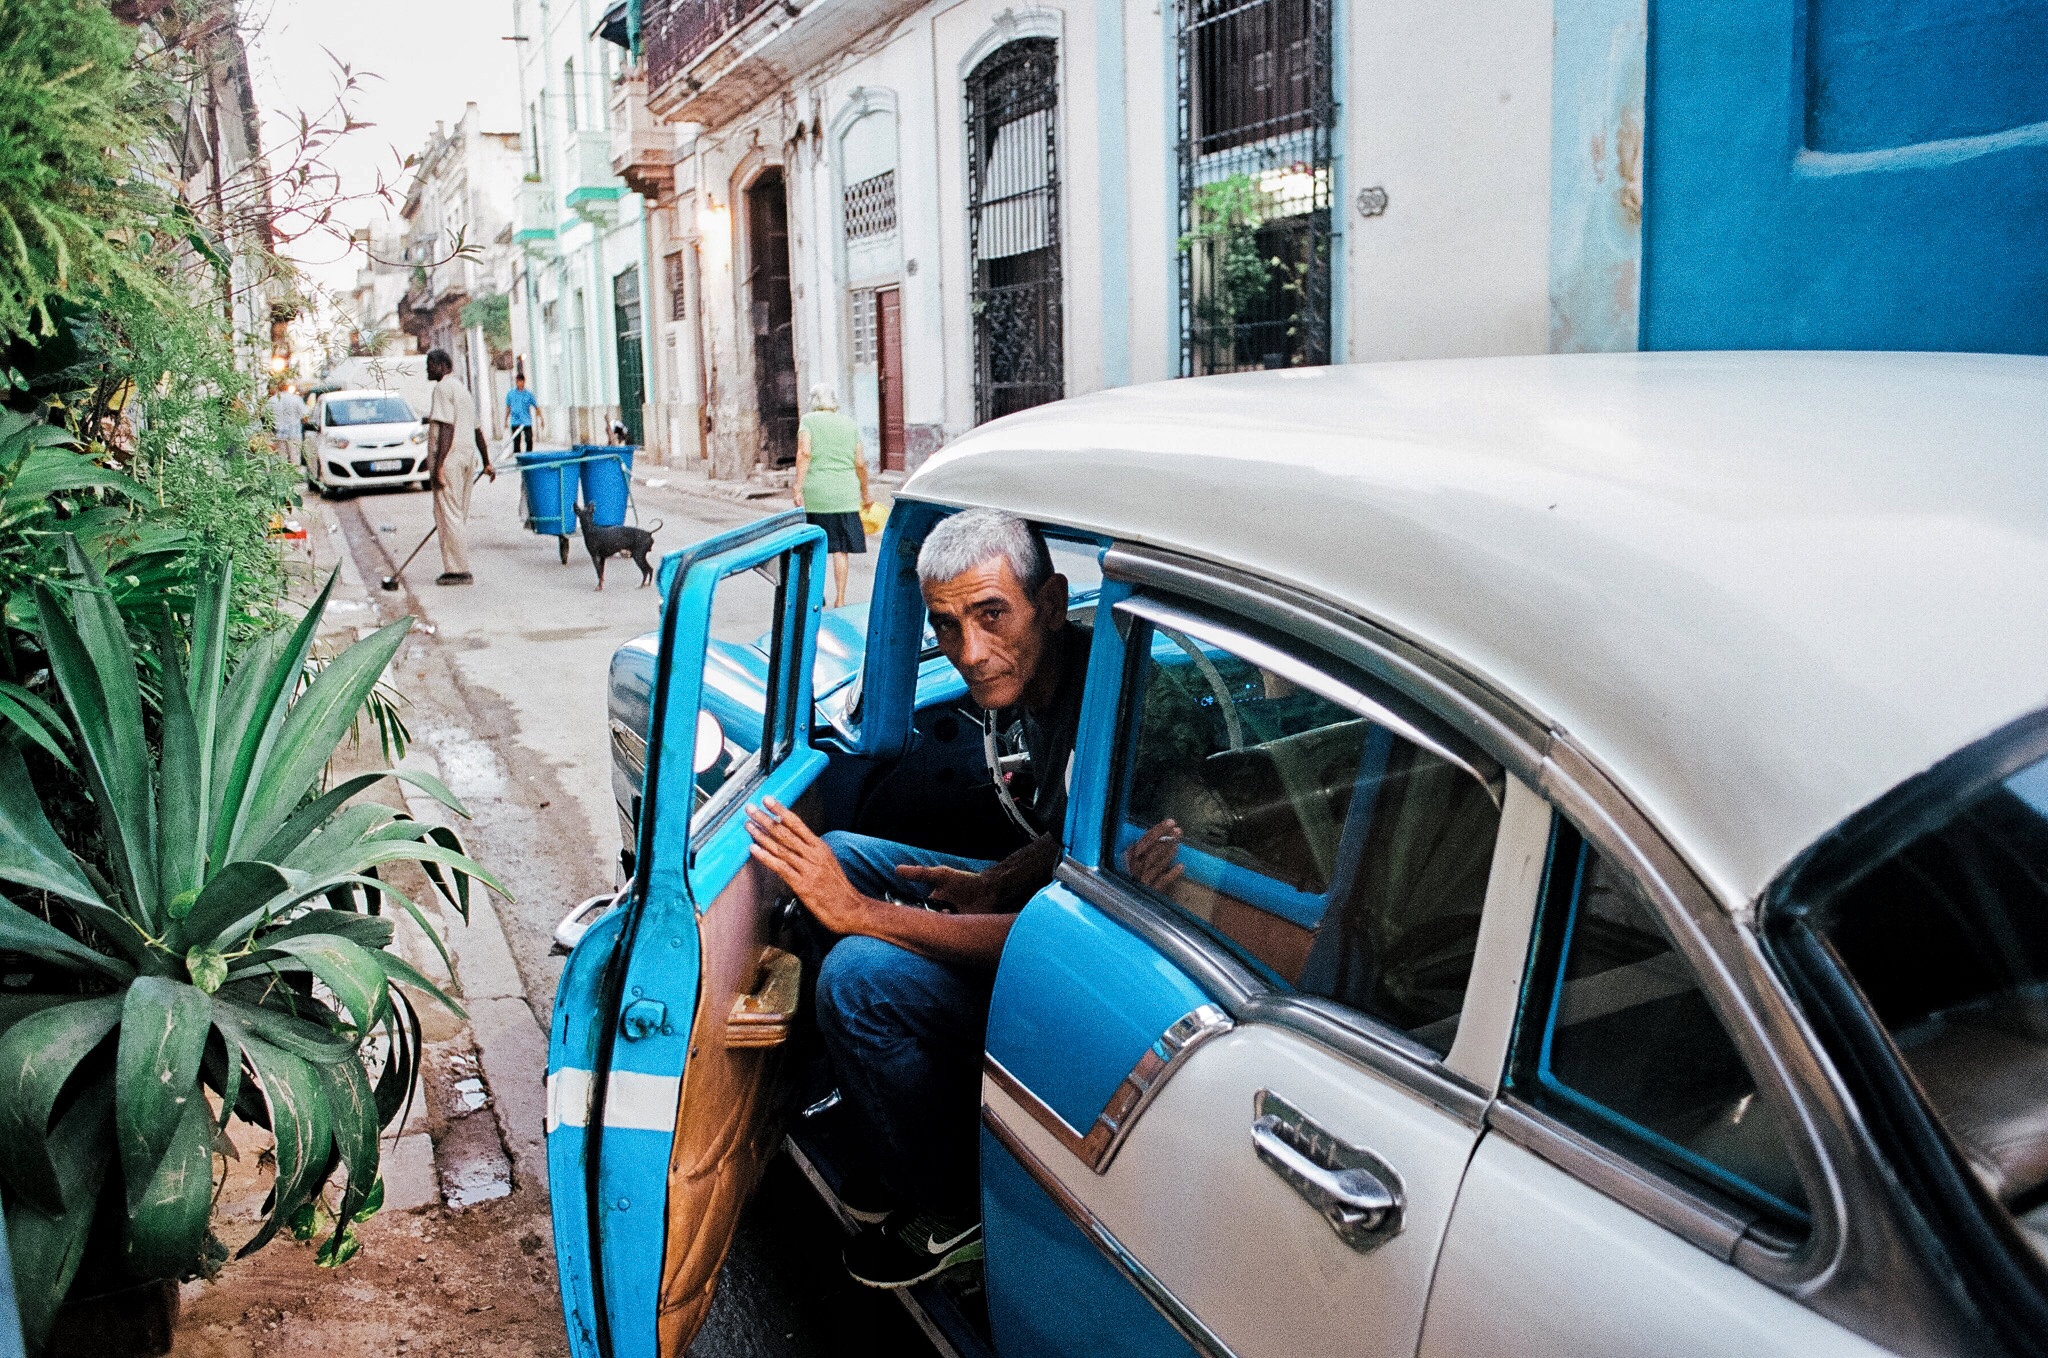 cuba 35mm film street portrait